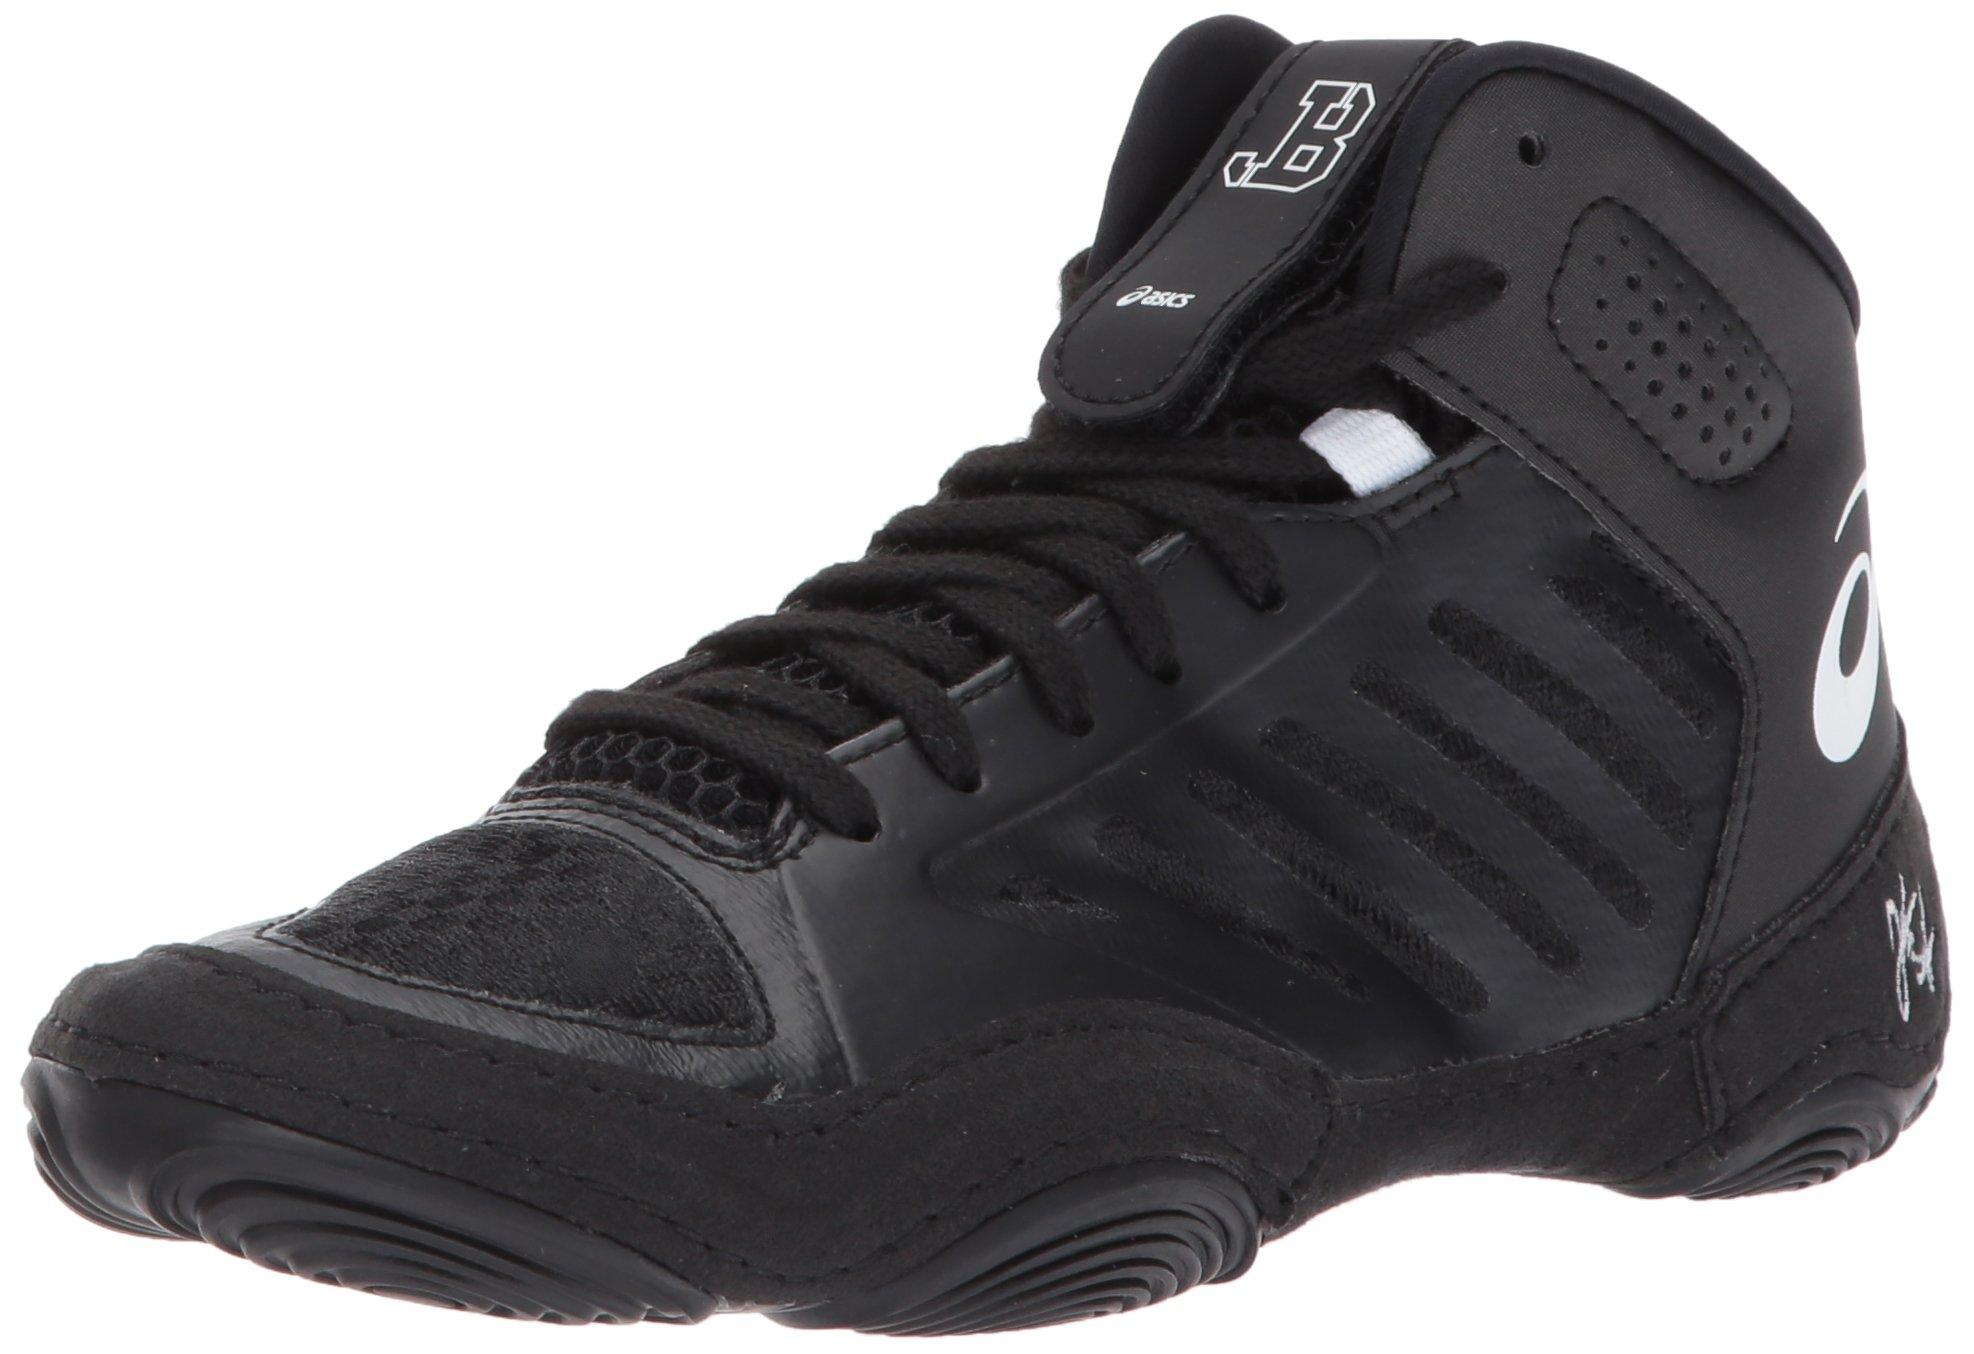 ASICS Unisex-Kids JB Elite III GS Wrestling-Shoes, Black/White, 2.5 Medium US Big Kid by ASICS